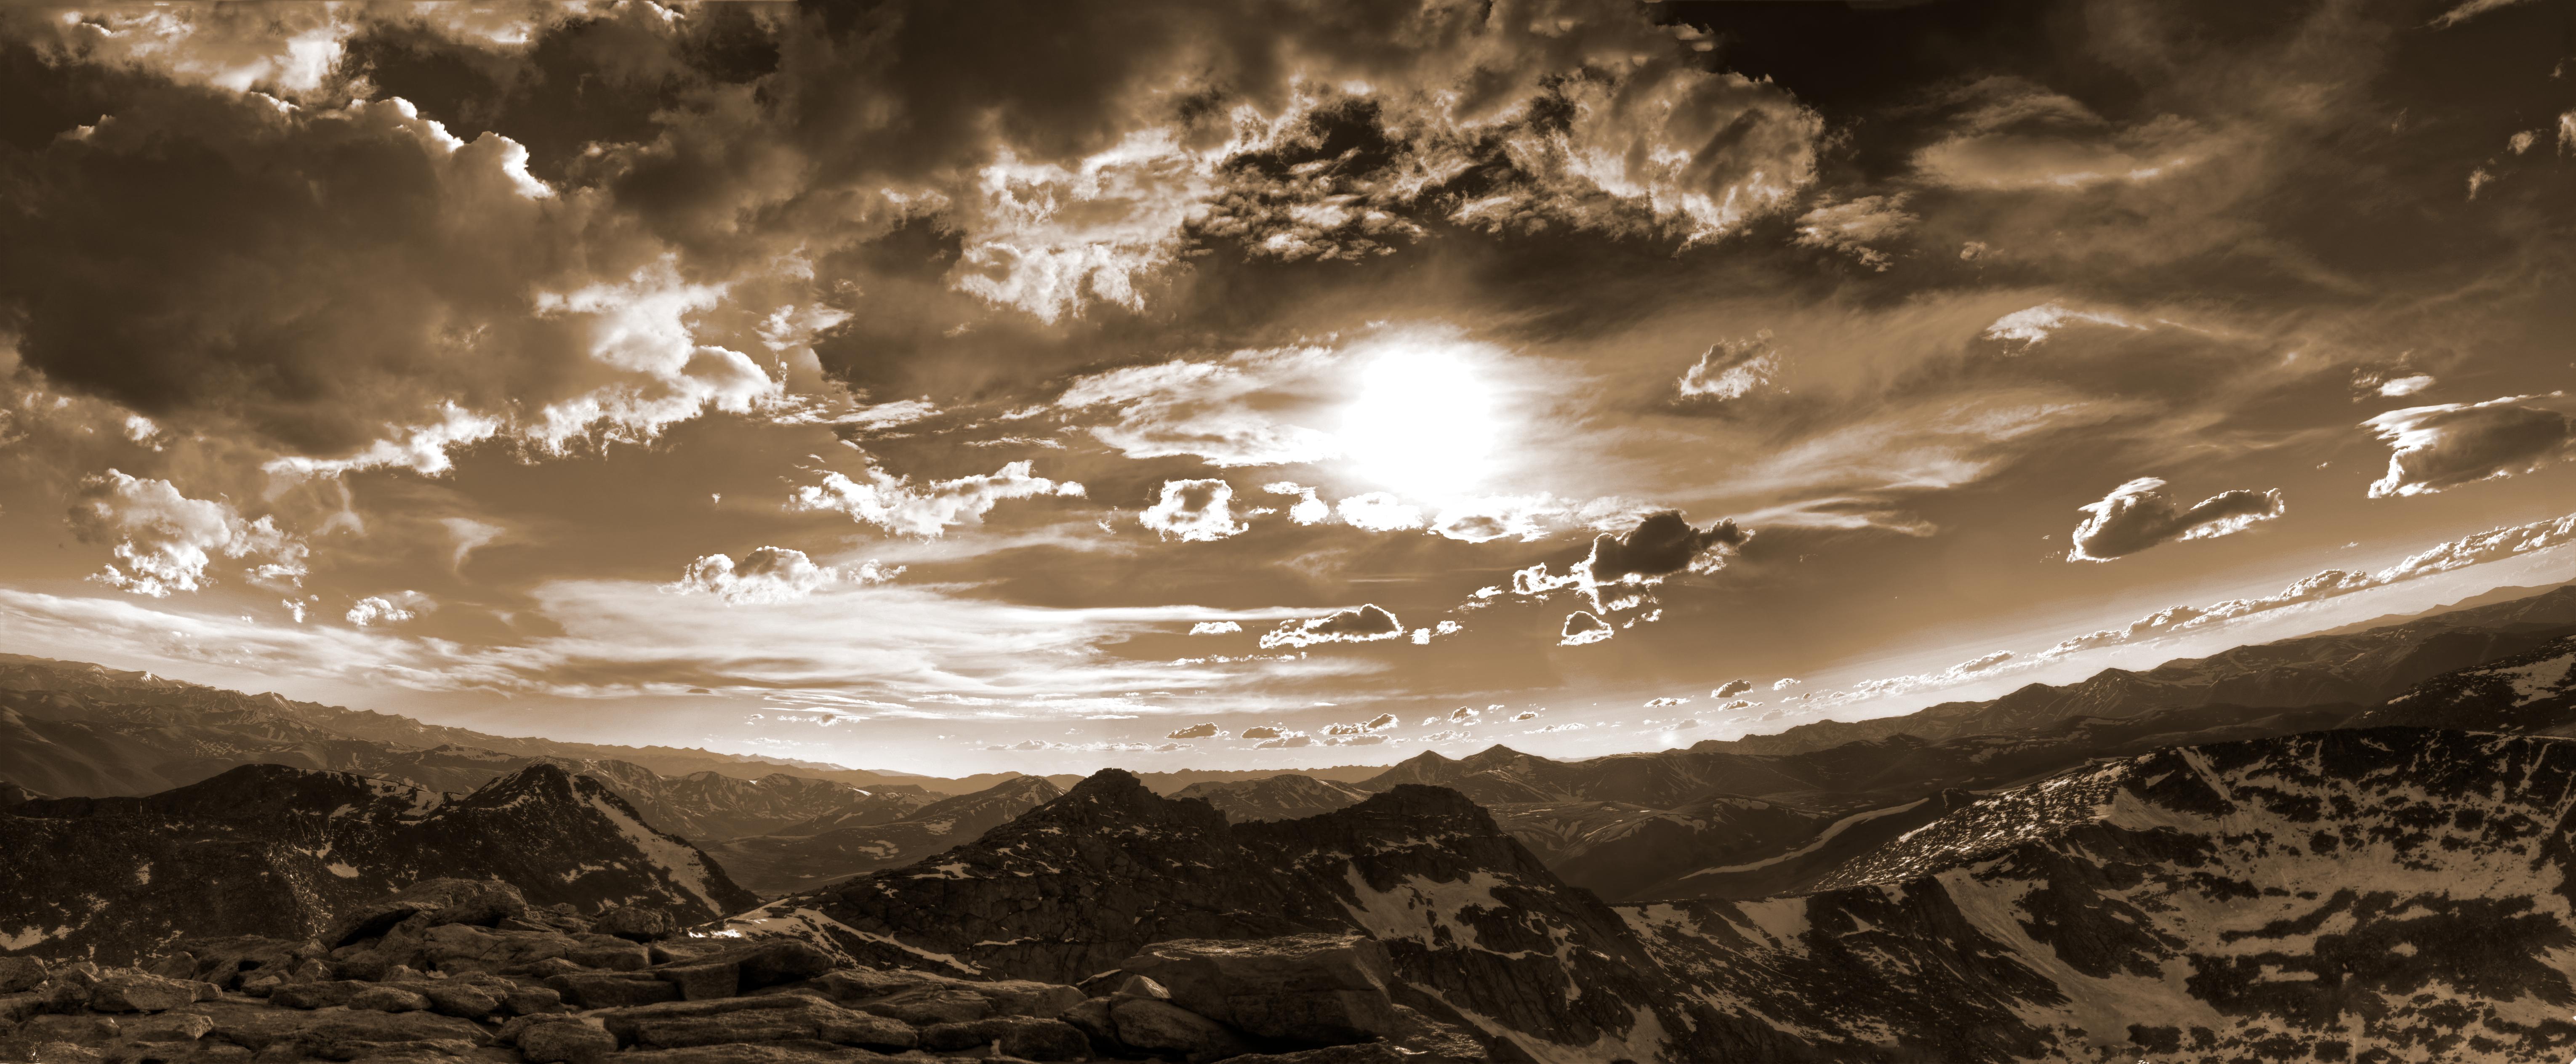 Free Images : nature, mountain, light, cloud, sky, night, sunlight ...